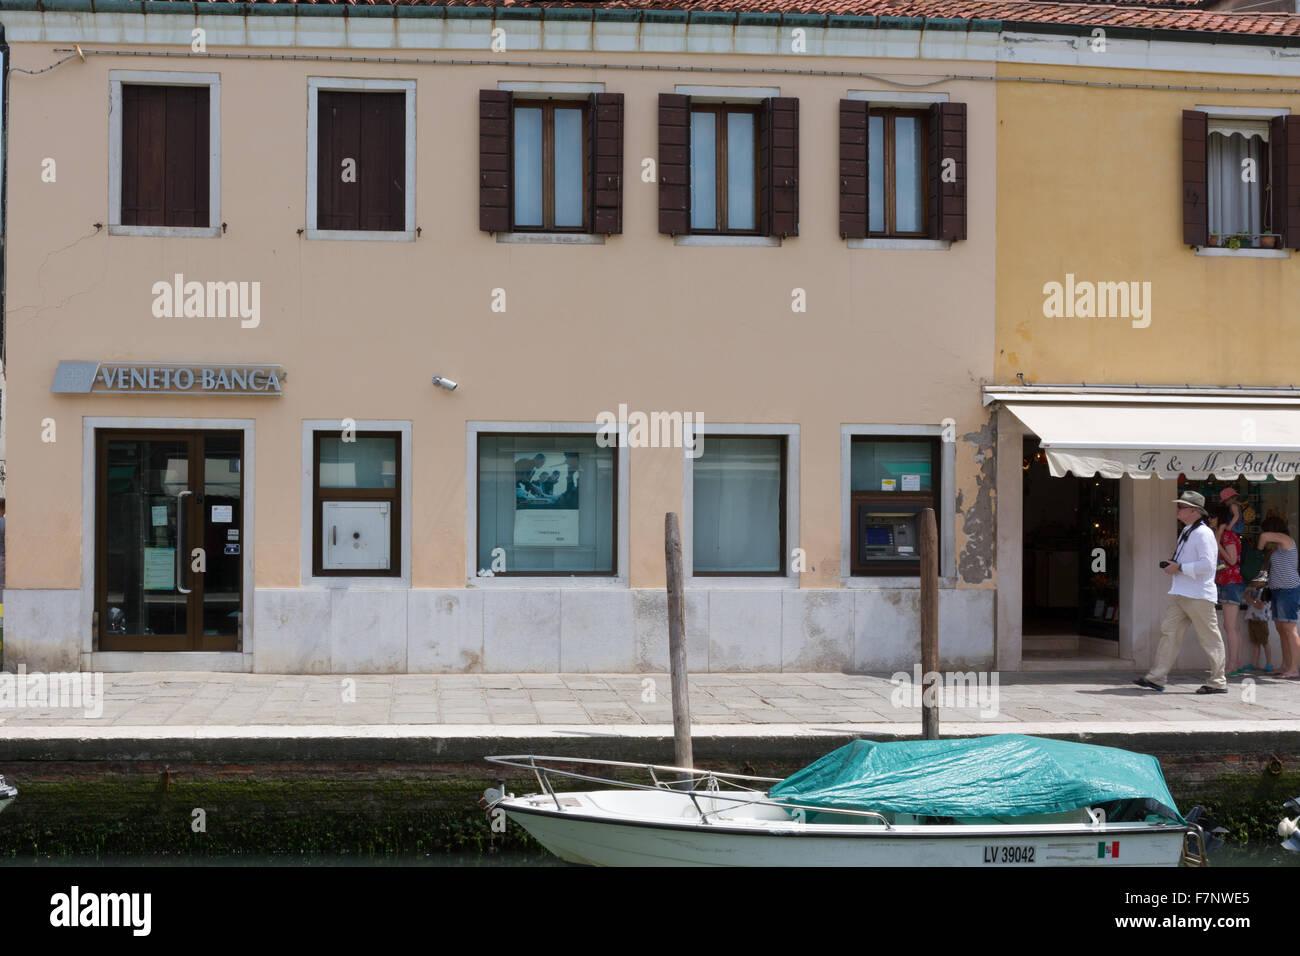 34++ Banche castelfranco veneto information